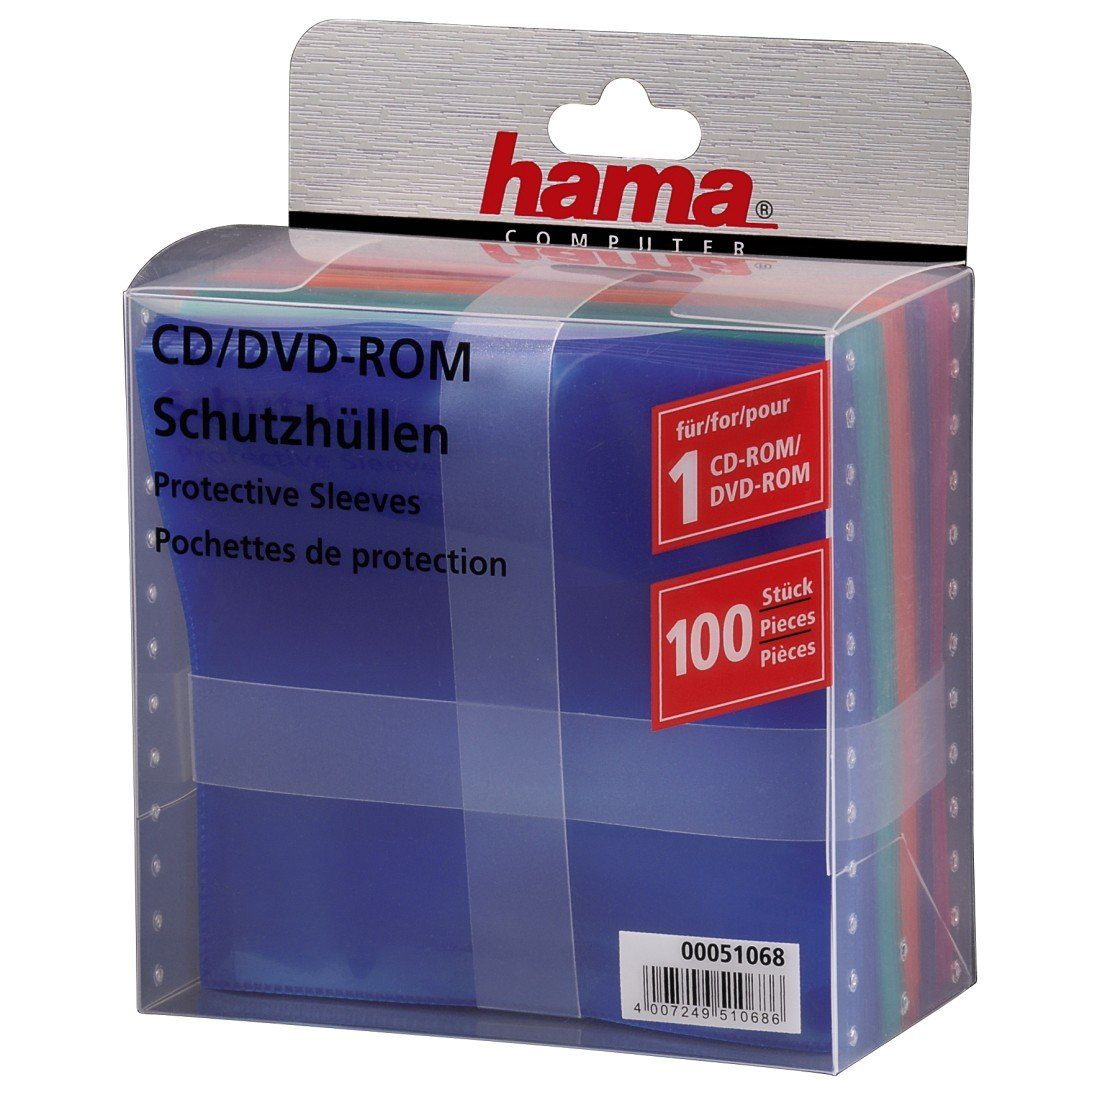 Hama CD-/DVD-Schutzhüllen 100, Farbig